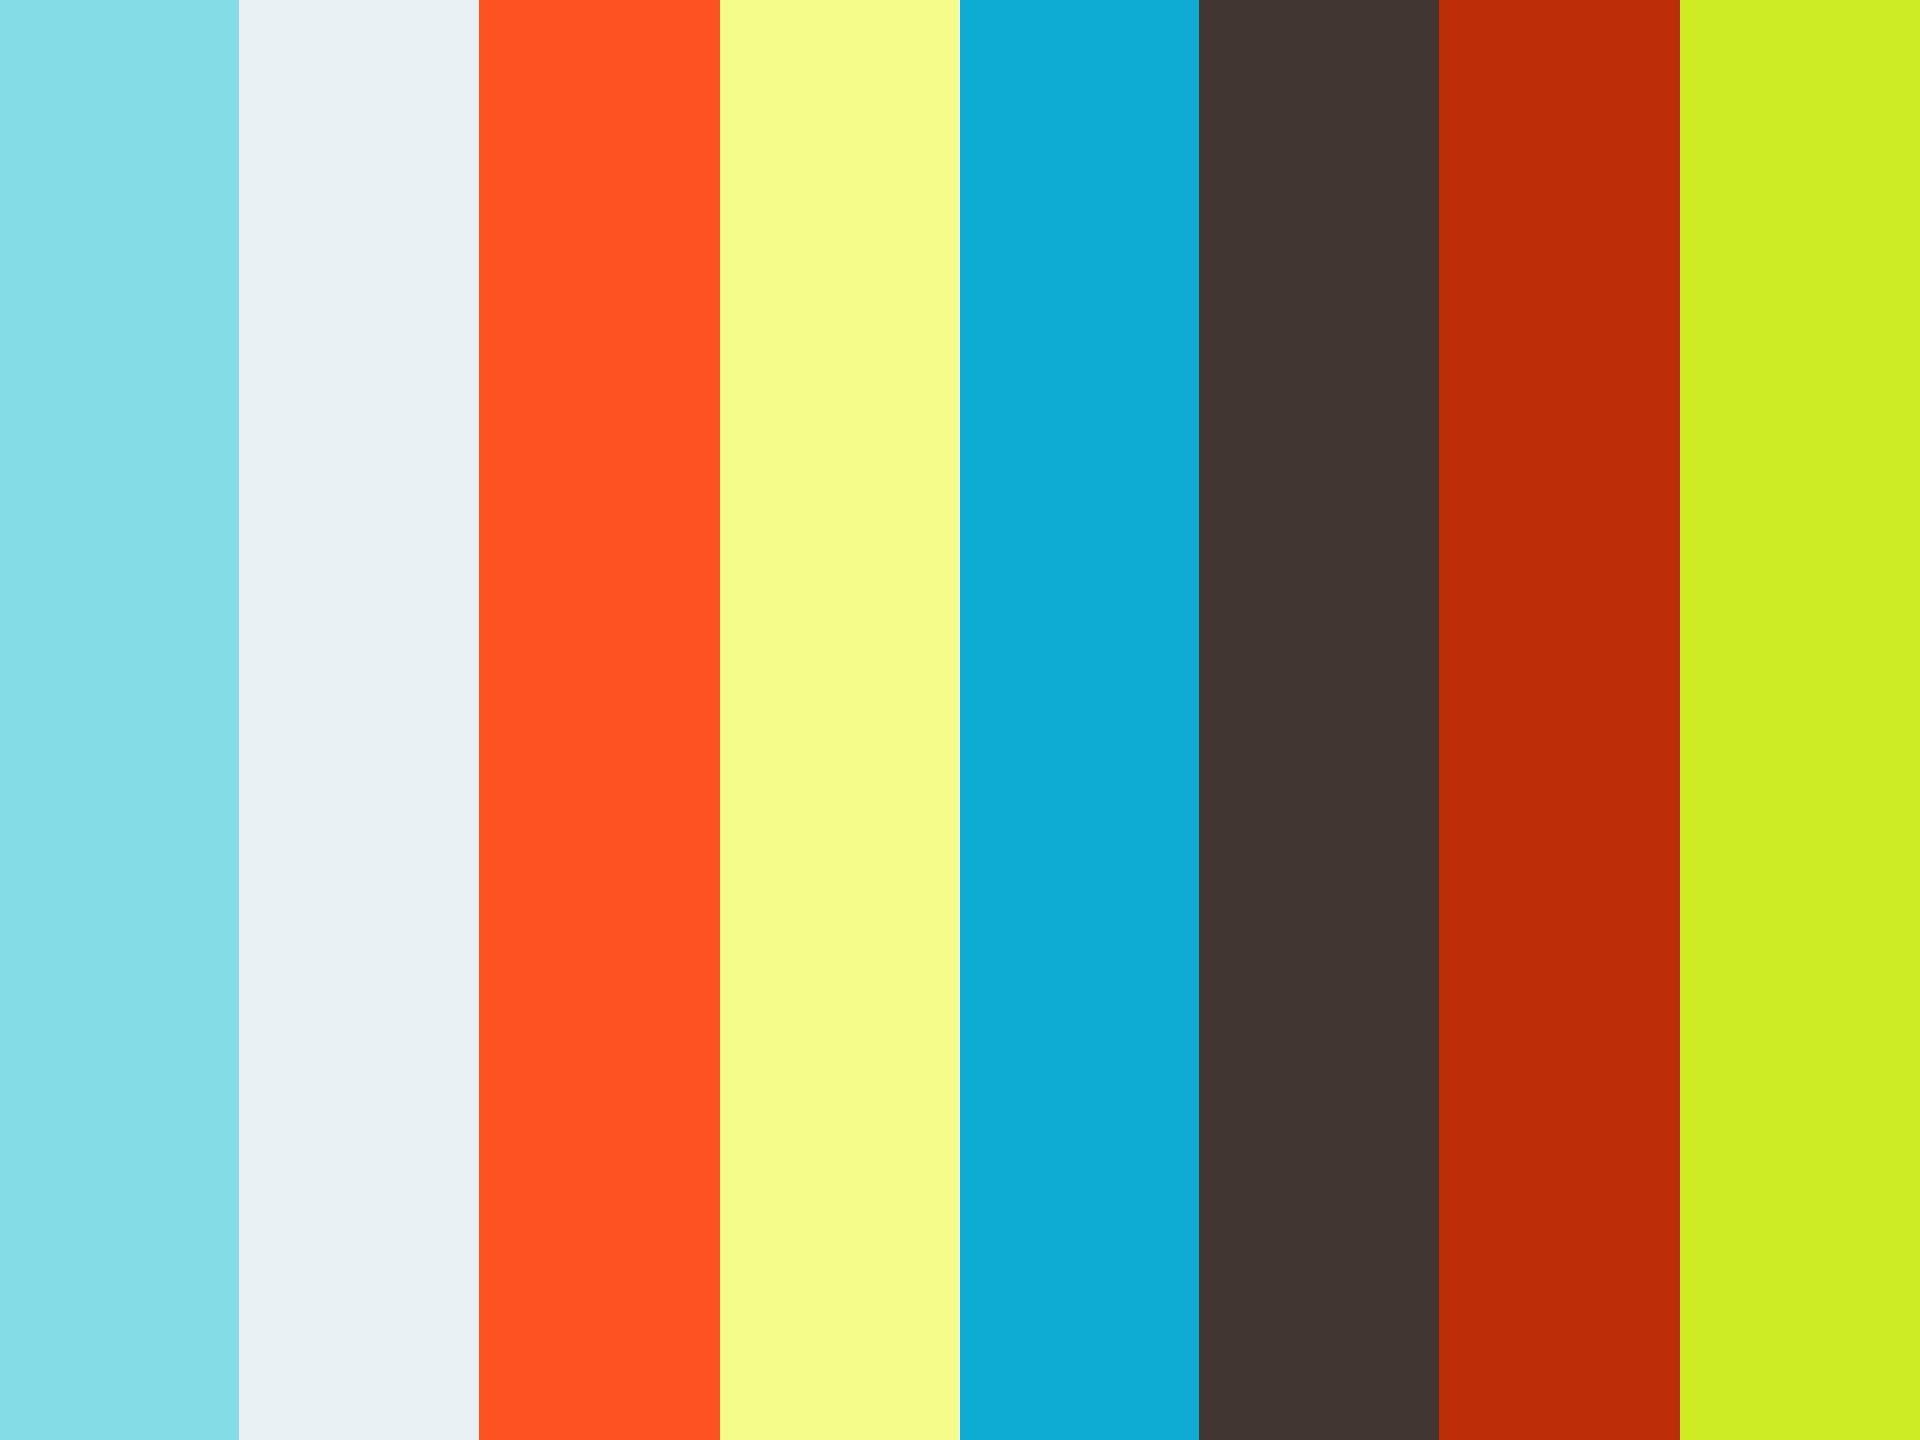 【Proflab】中原 貴教授インタビュー:日本歯科大学 生命歯学部 発生・再生医科学講座 #2 研究紹介